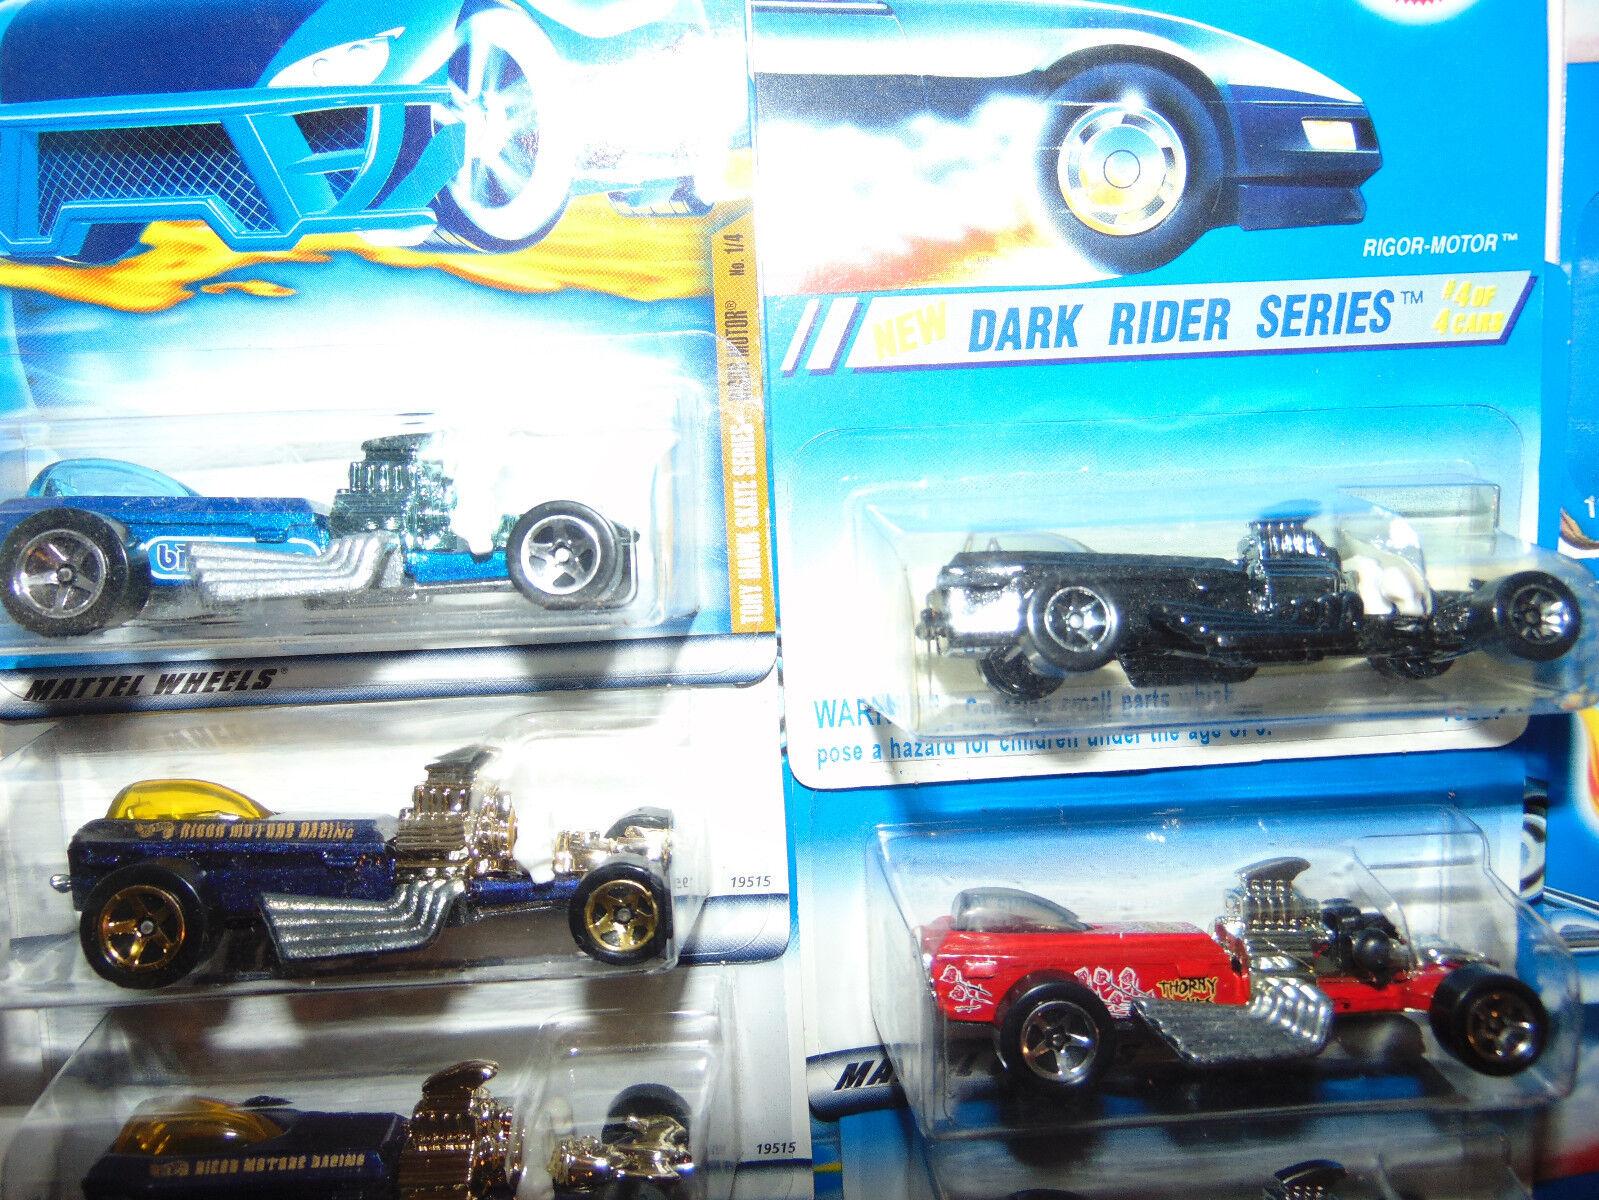 11) Hot Wheels RIGOR-MOTOR UPSIDE UPSIDE UPSIDE DOWN ERROR bluee Card 247 11849 13287 19515 SET b4354b